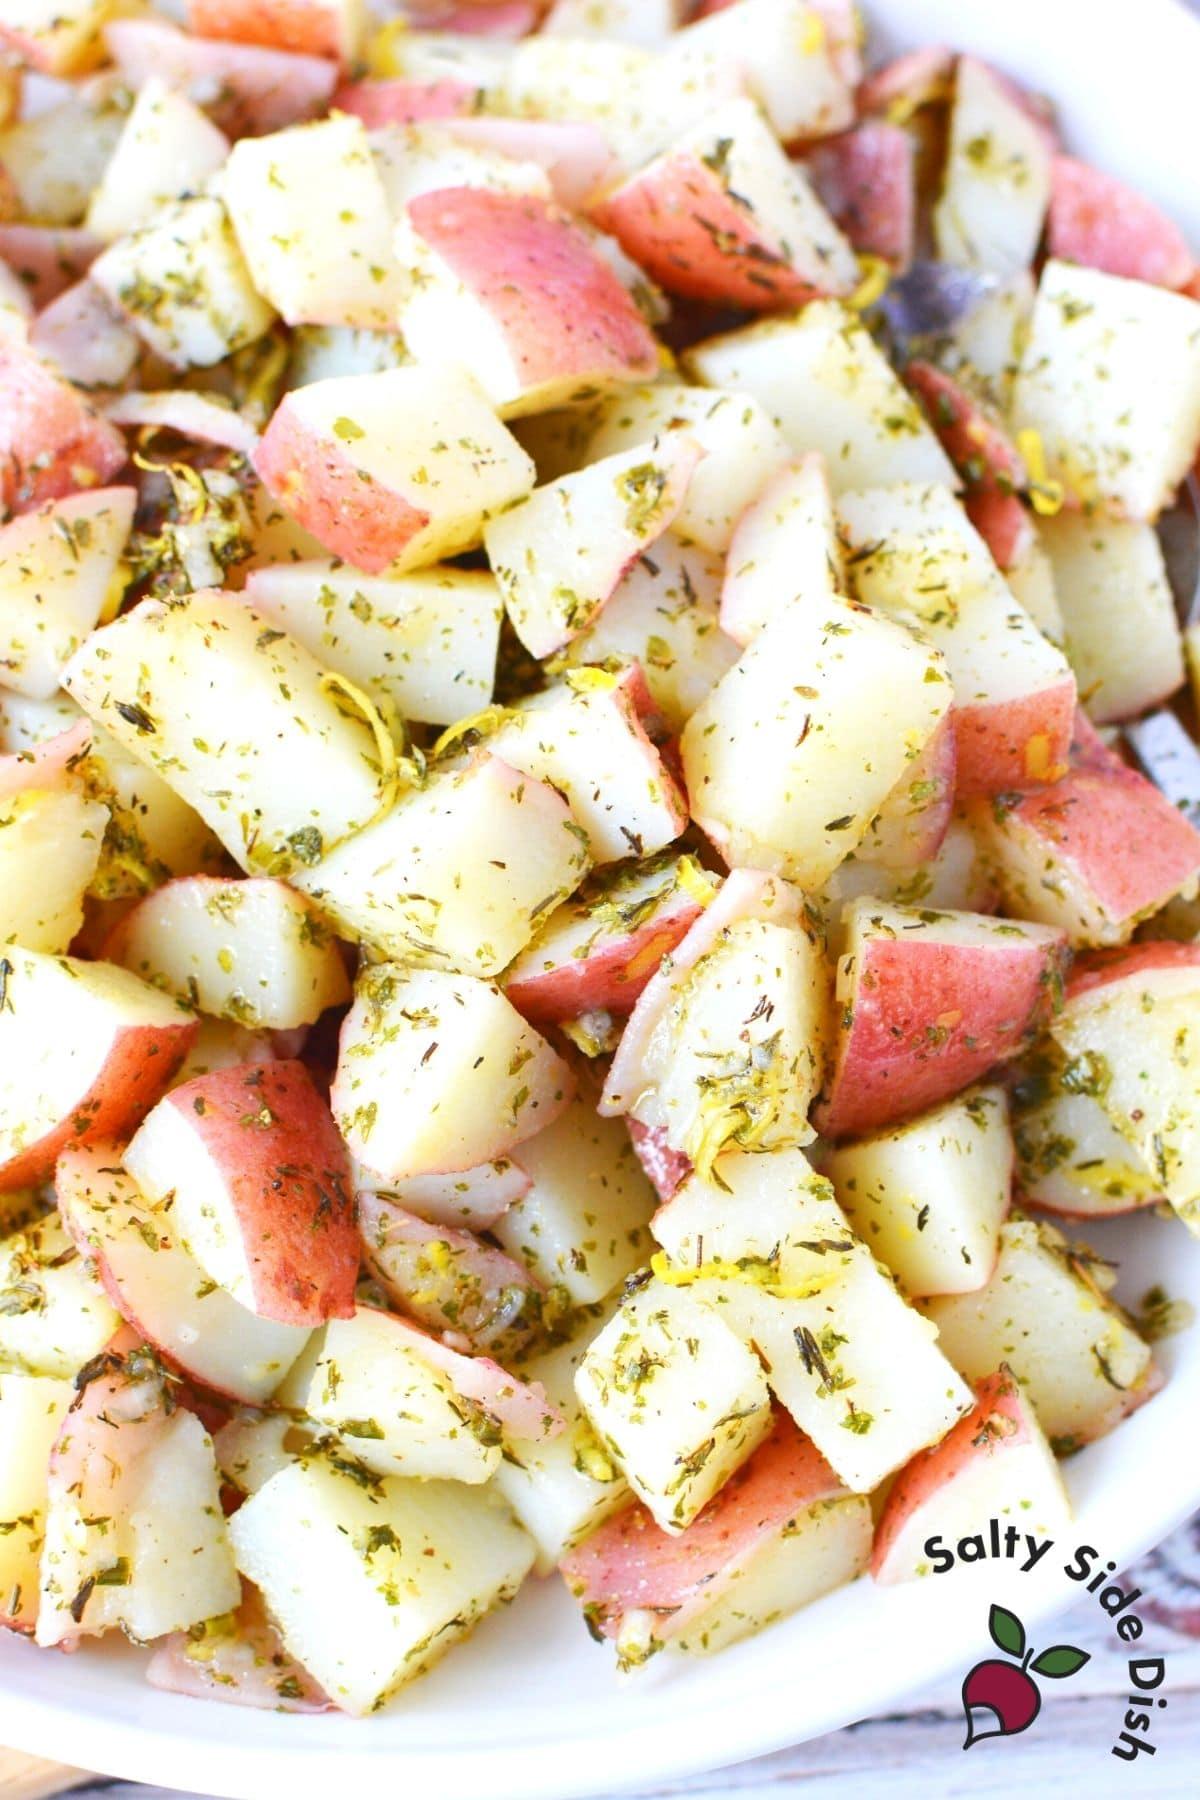 warm red potato salad recipe